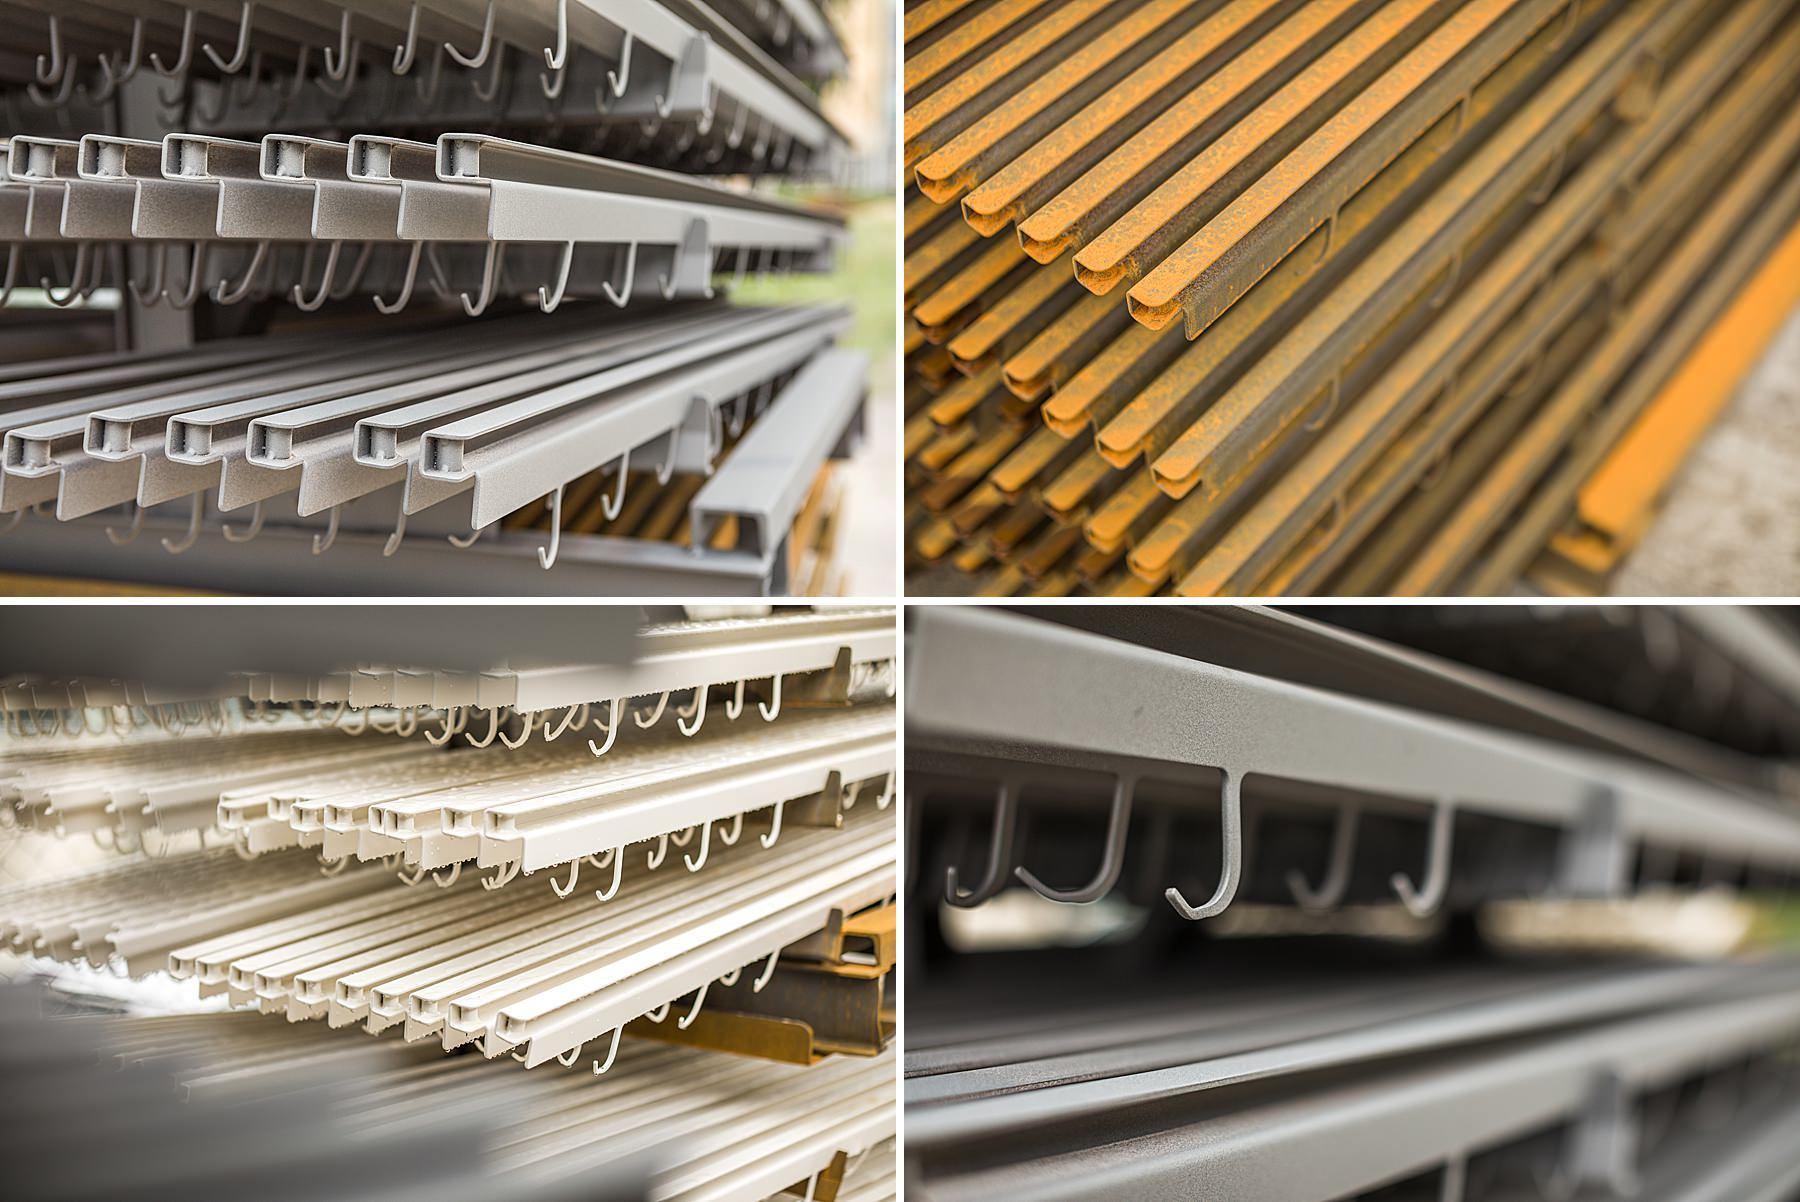 fotografia aziendale carpenteria metallica